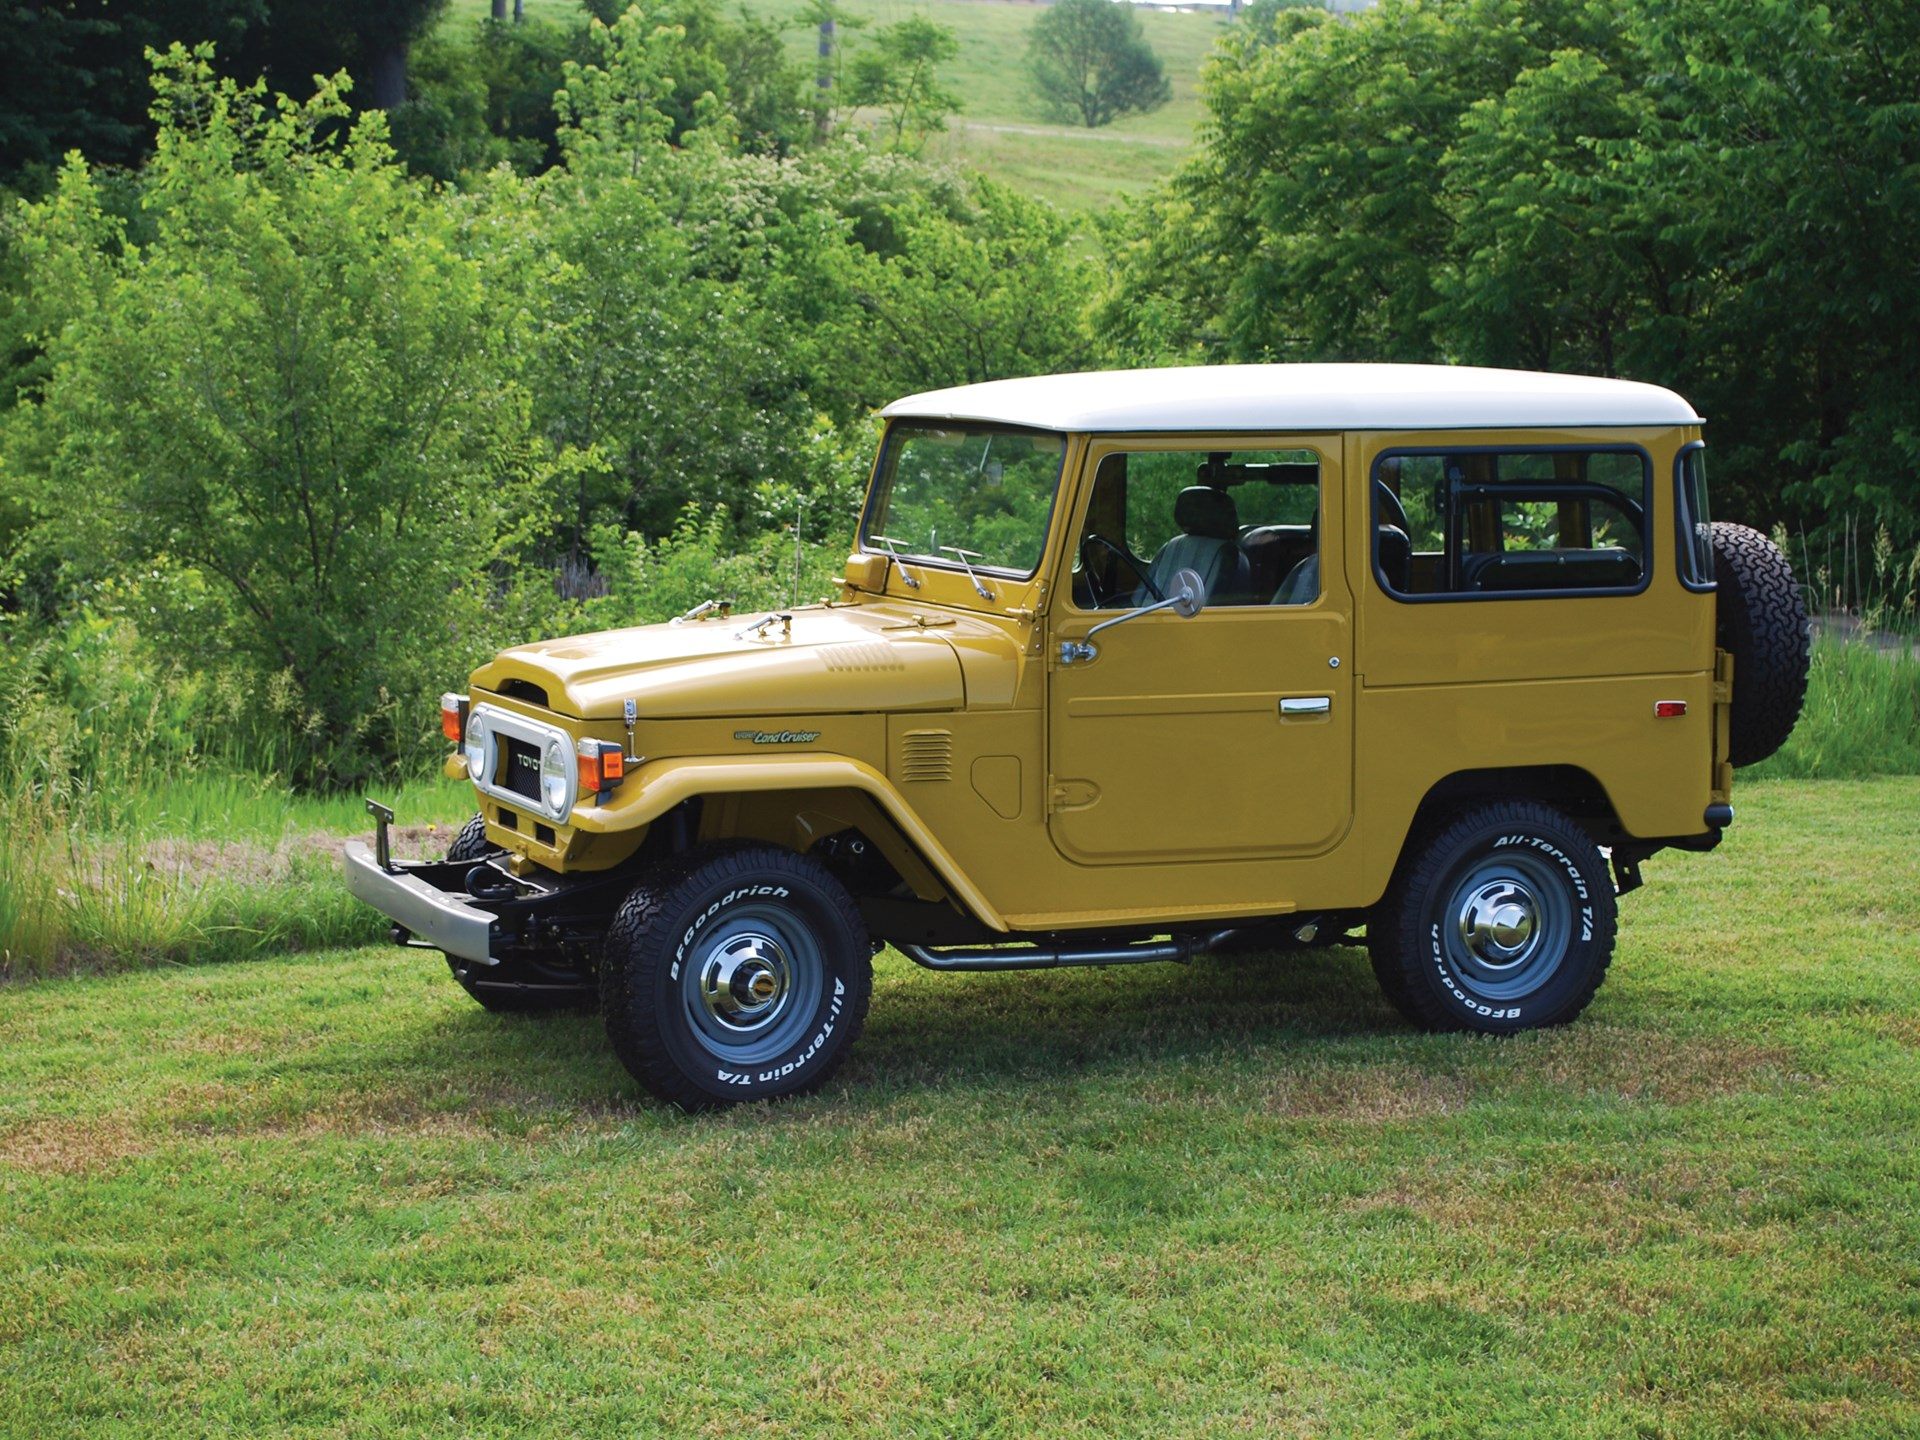 Toyota Fj40 For Sale >> RM Sotheby's - 1976 Toyota Land Cruiser FJ40 | Motor City 2014